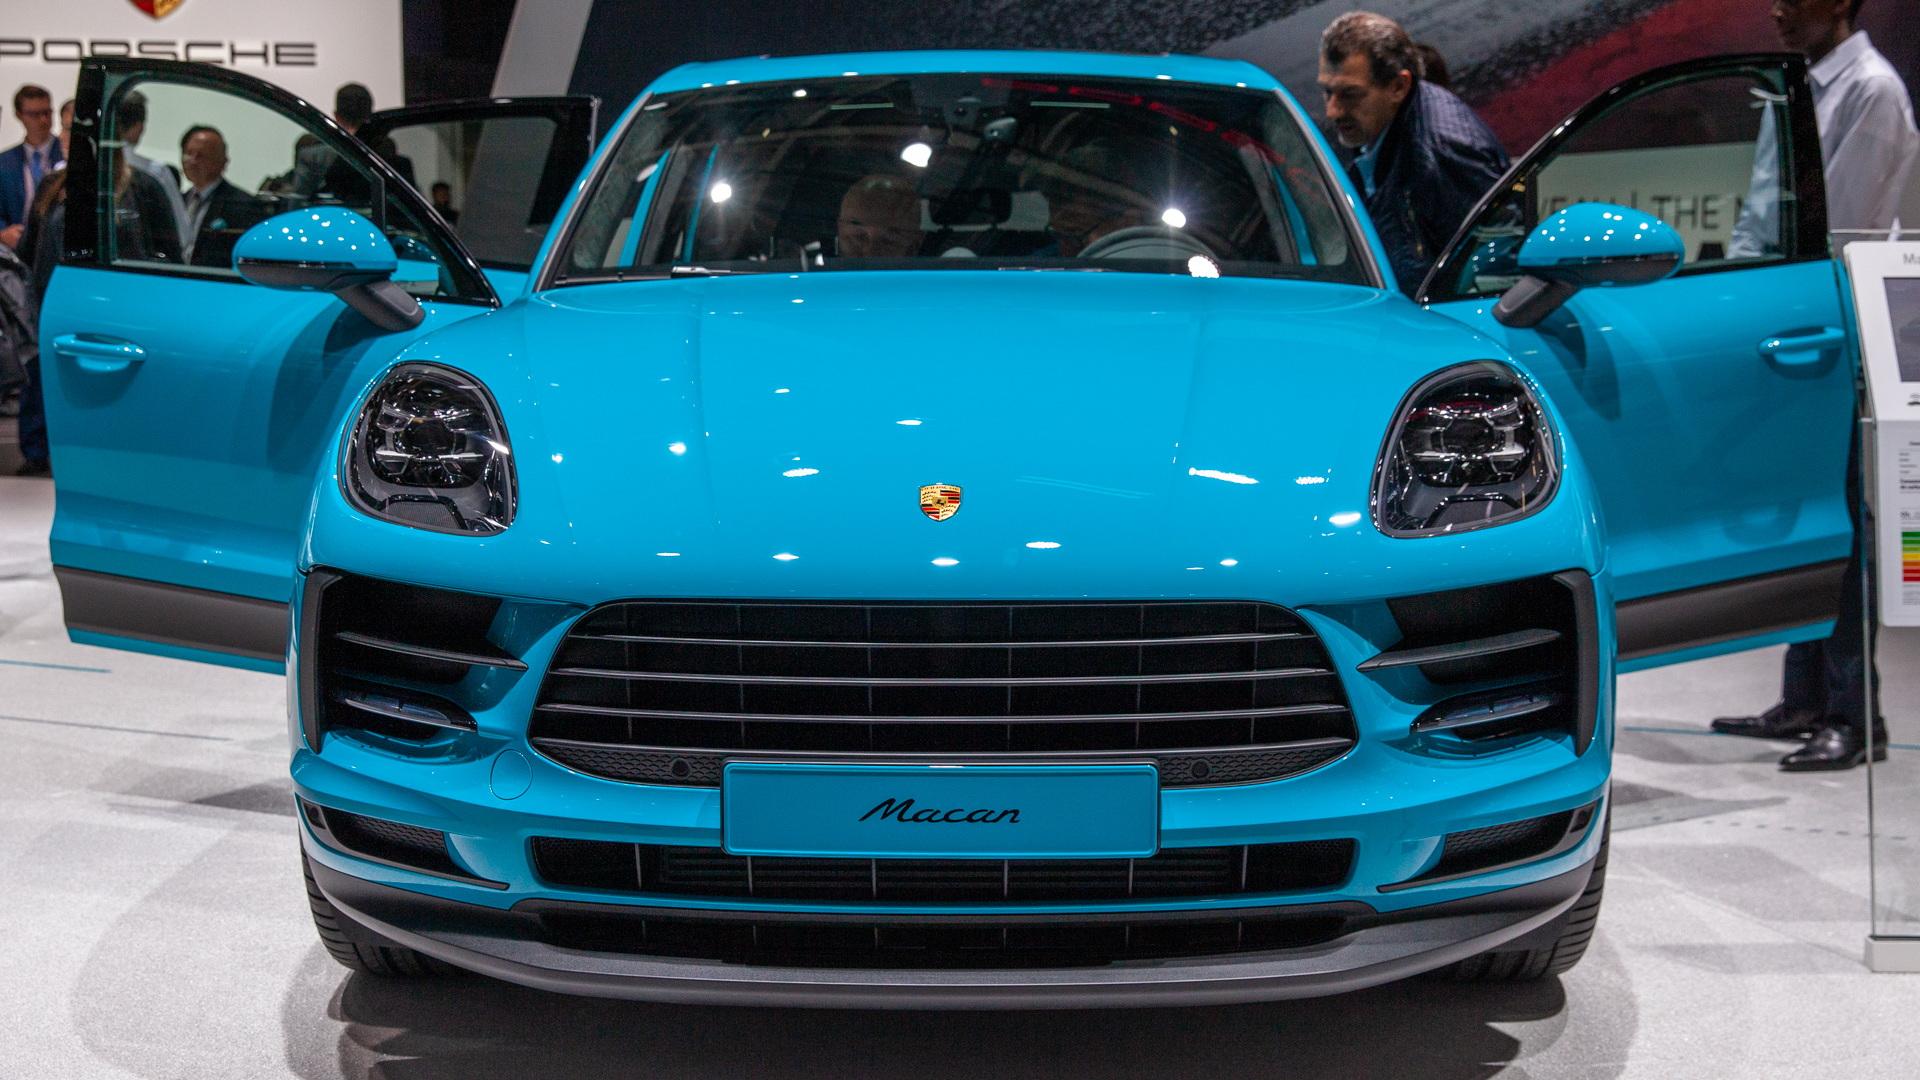 2019 Porsche Macan, 2018 Paris auto show